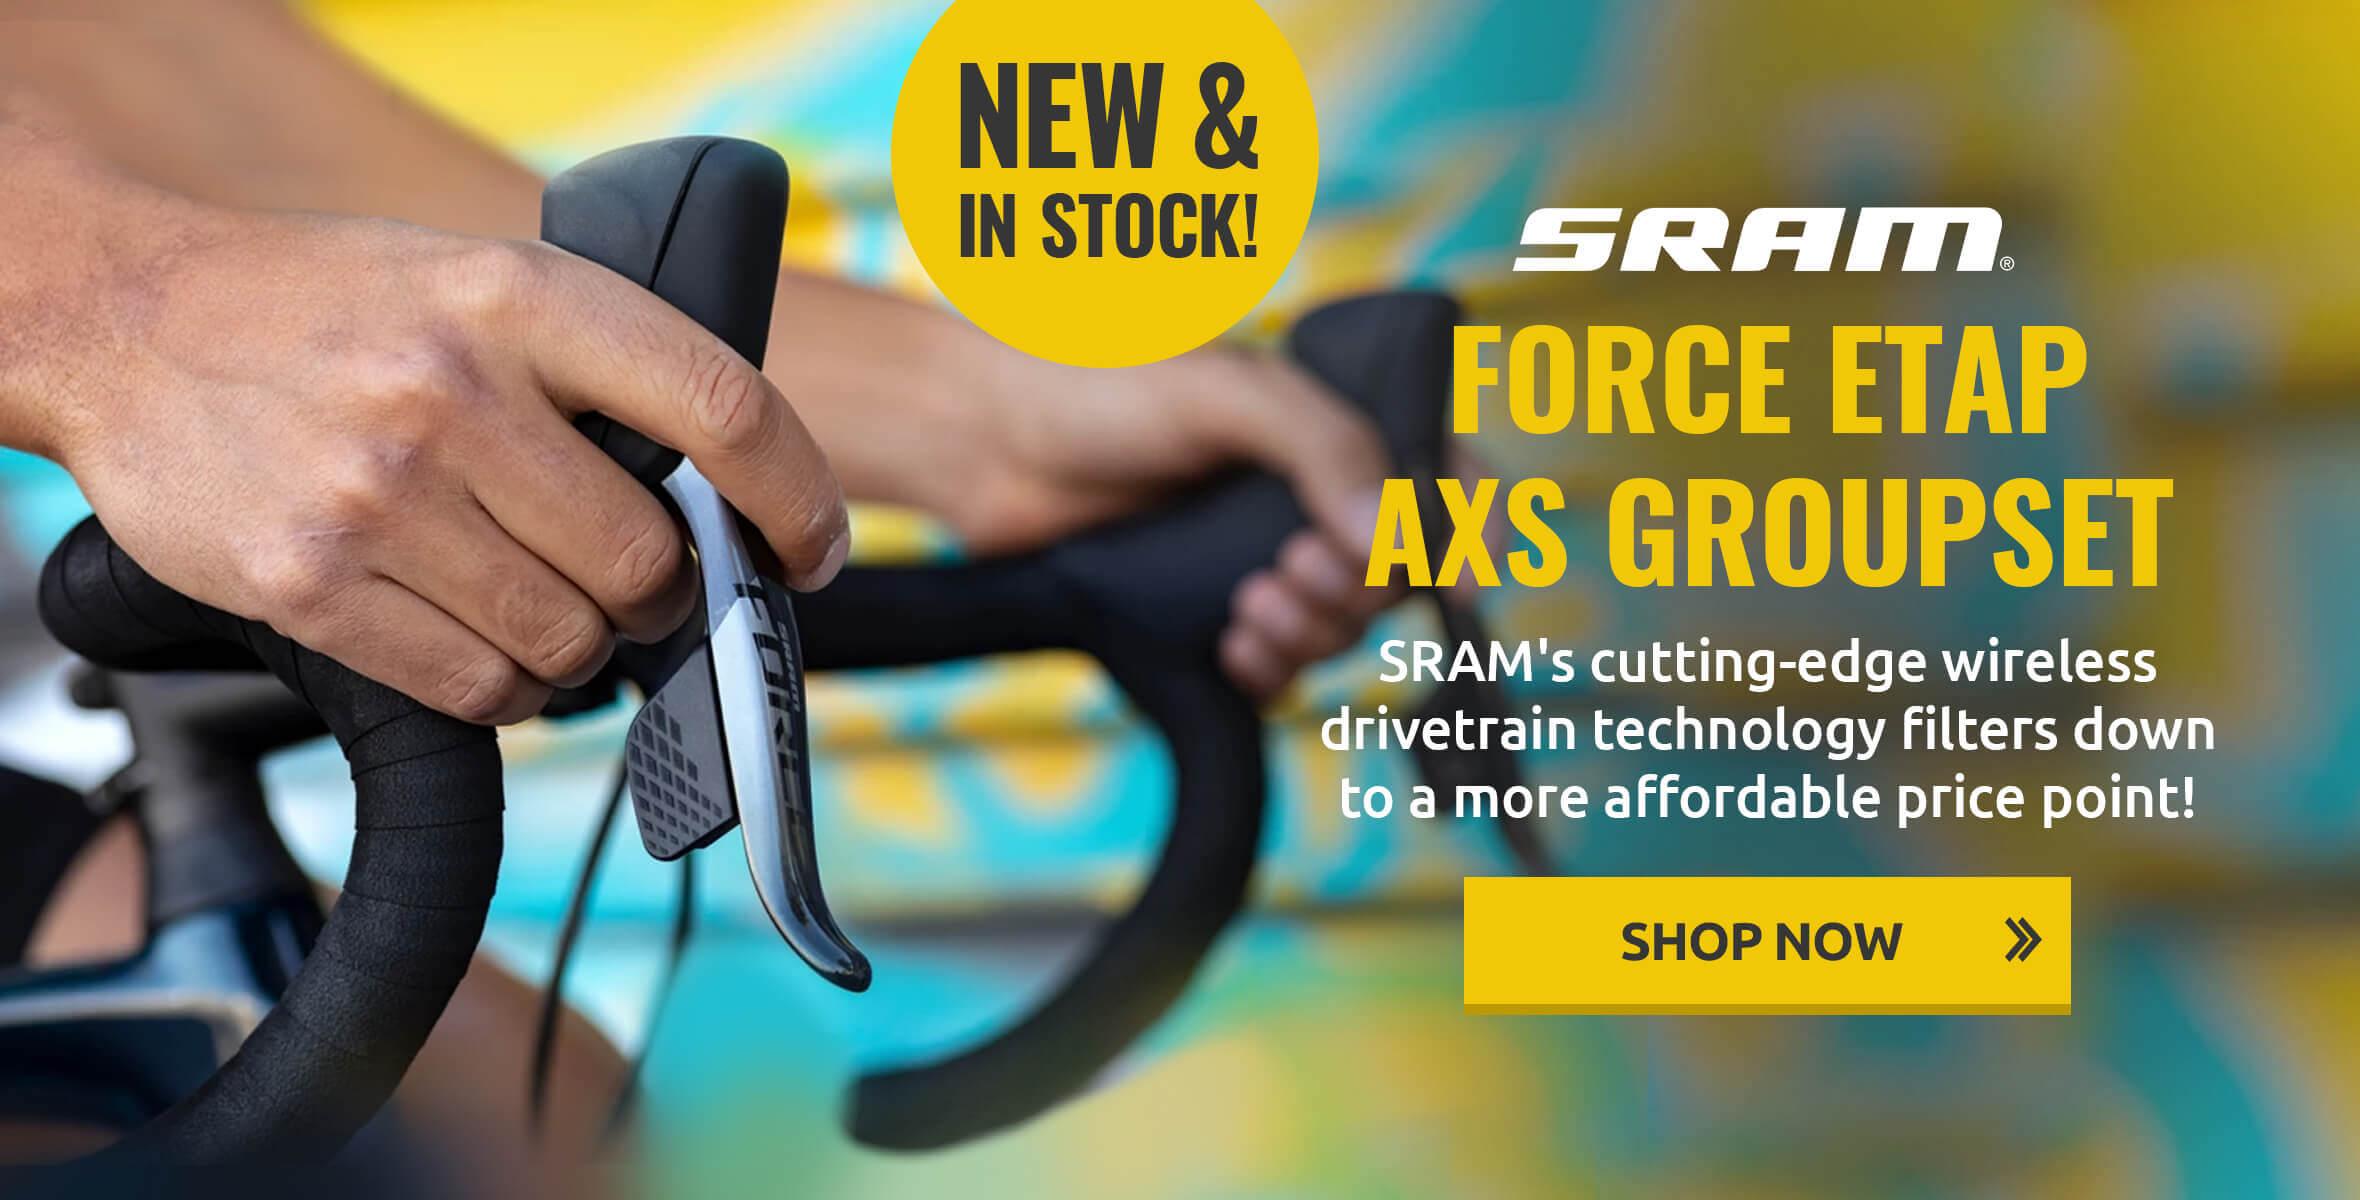 SRAM Force eTap AXS Groupset